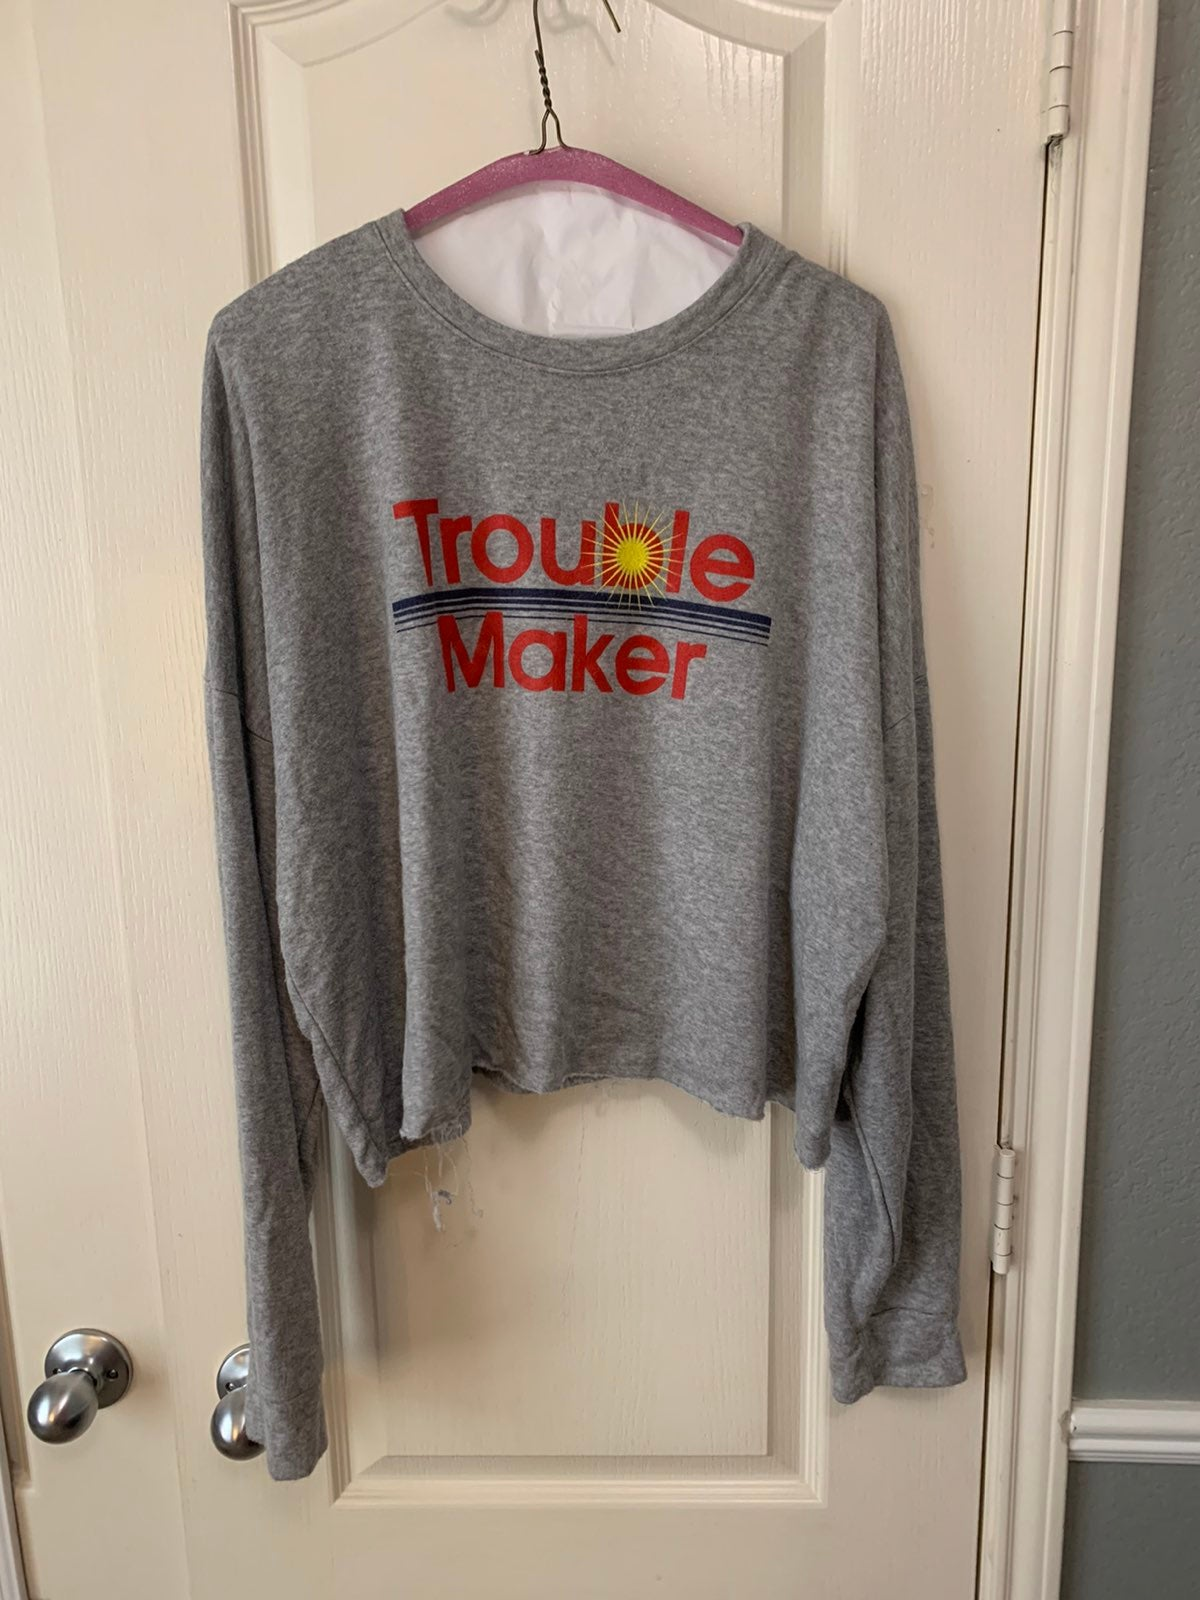 Trouble maker criop top